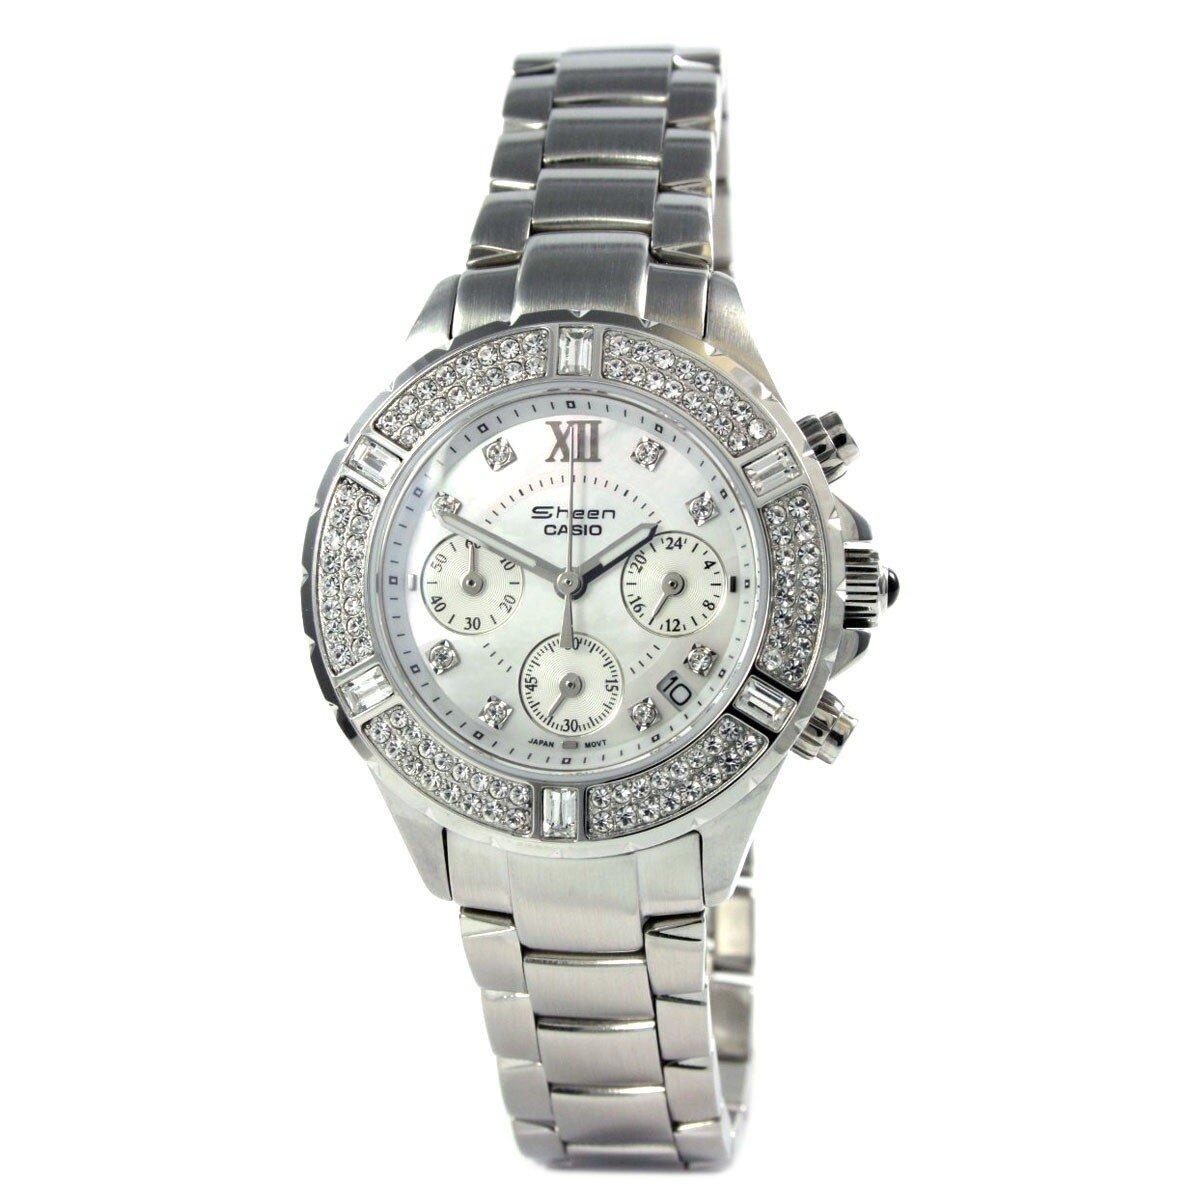 Đồng hồ nữ Casio SHE-3023D